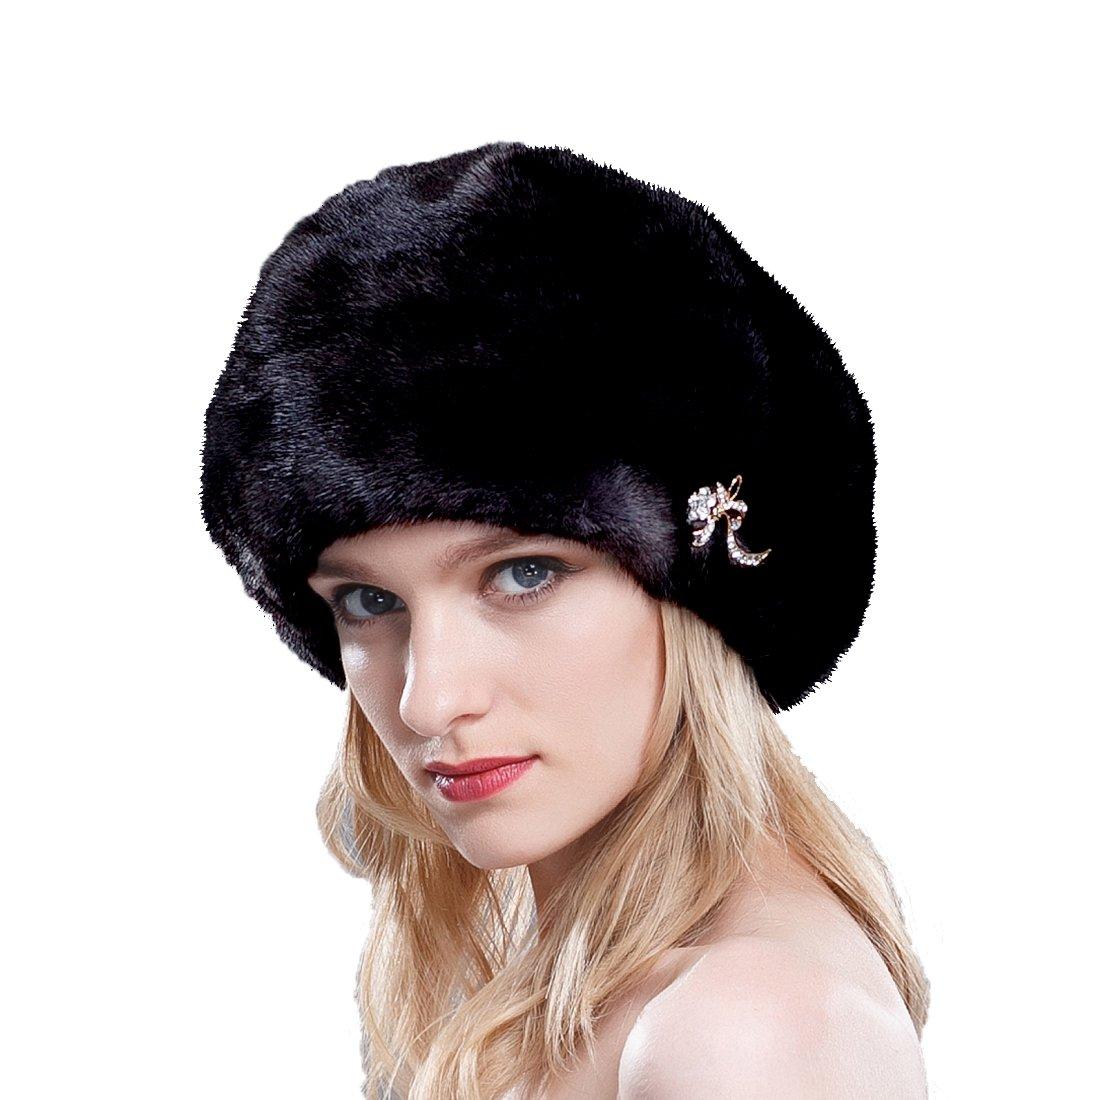 URSFUR Ladie's Mink Full Fur Beret Hats (One Size, Black)